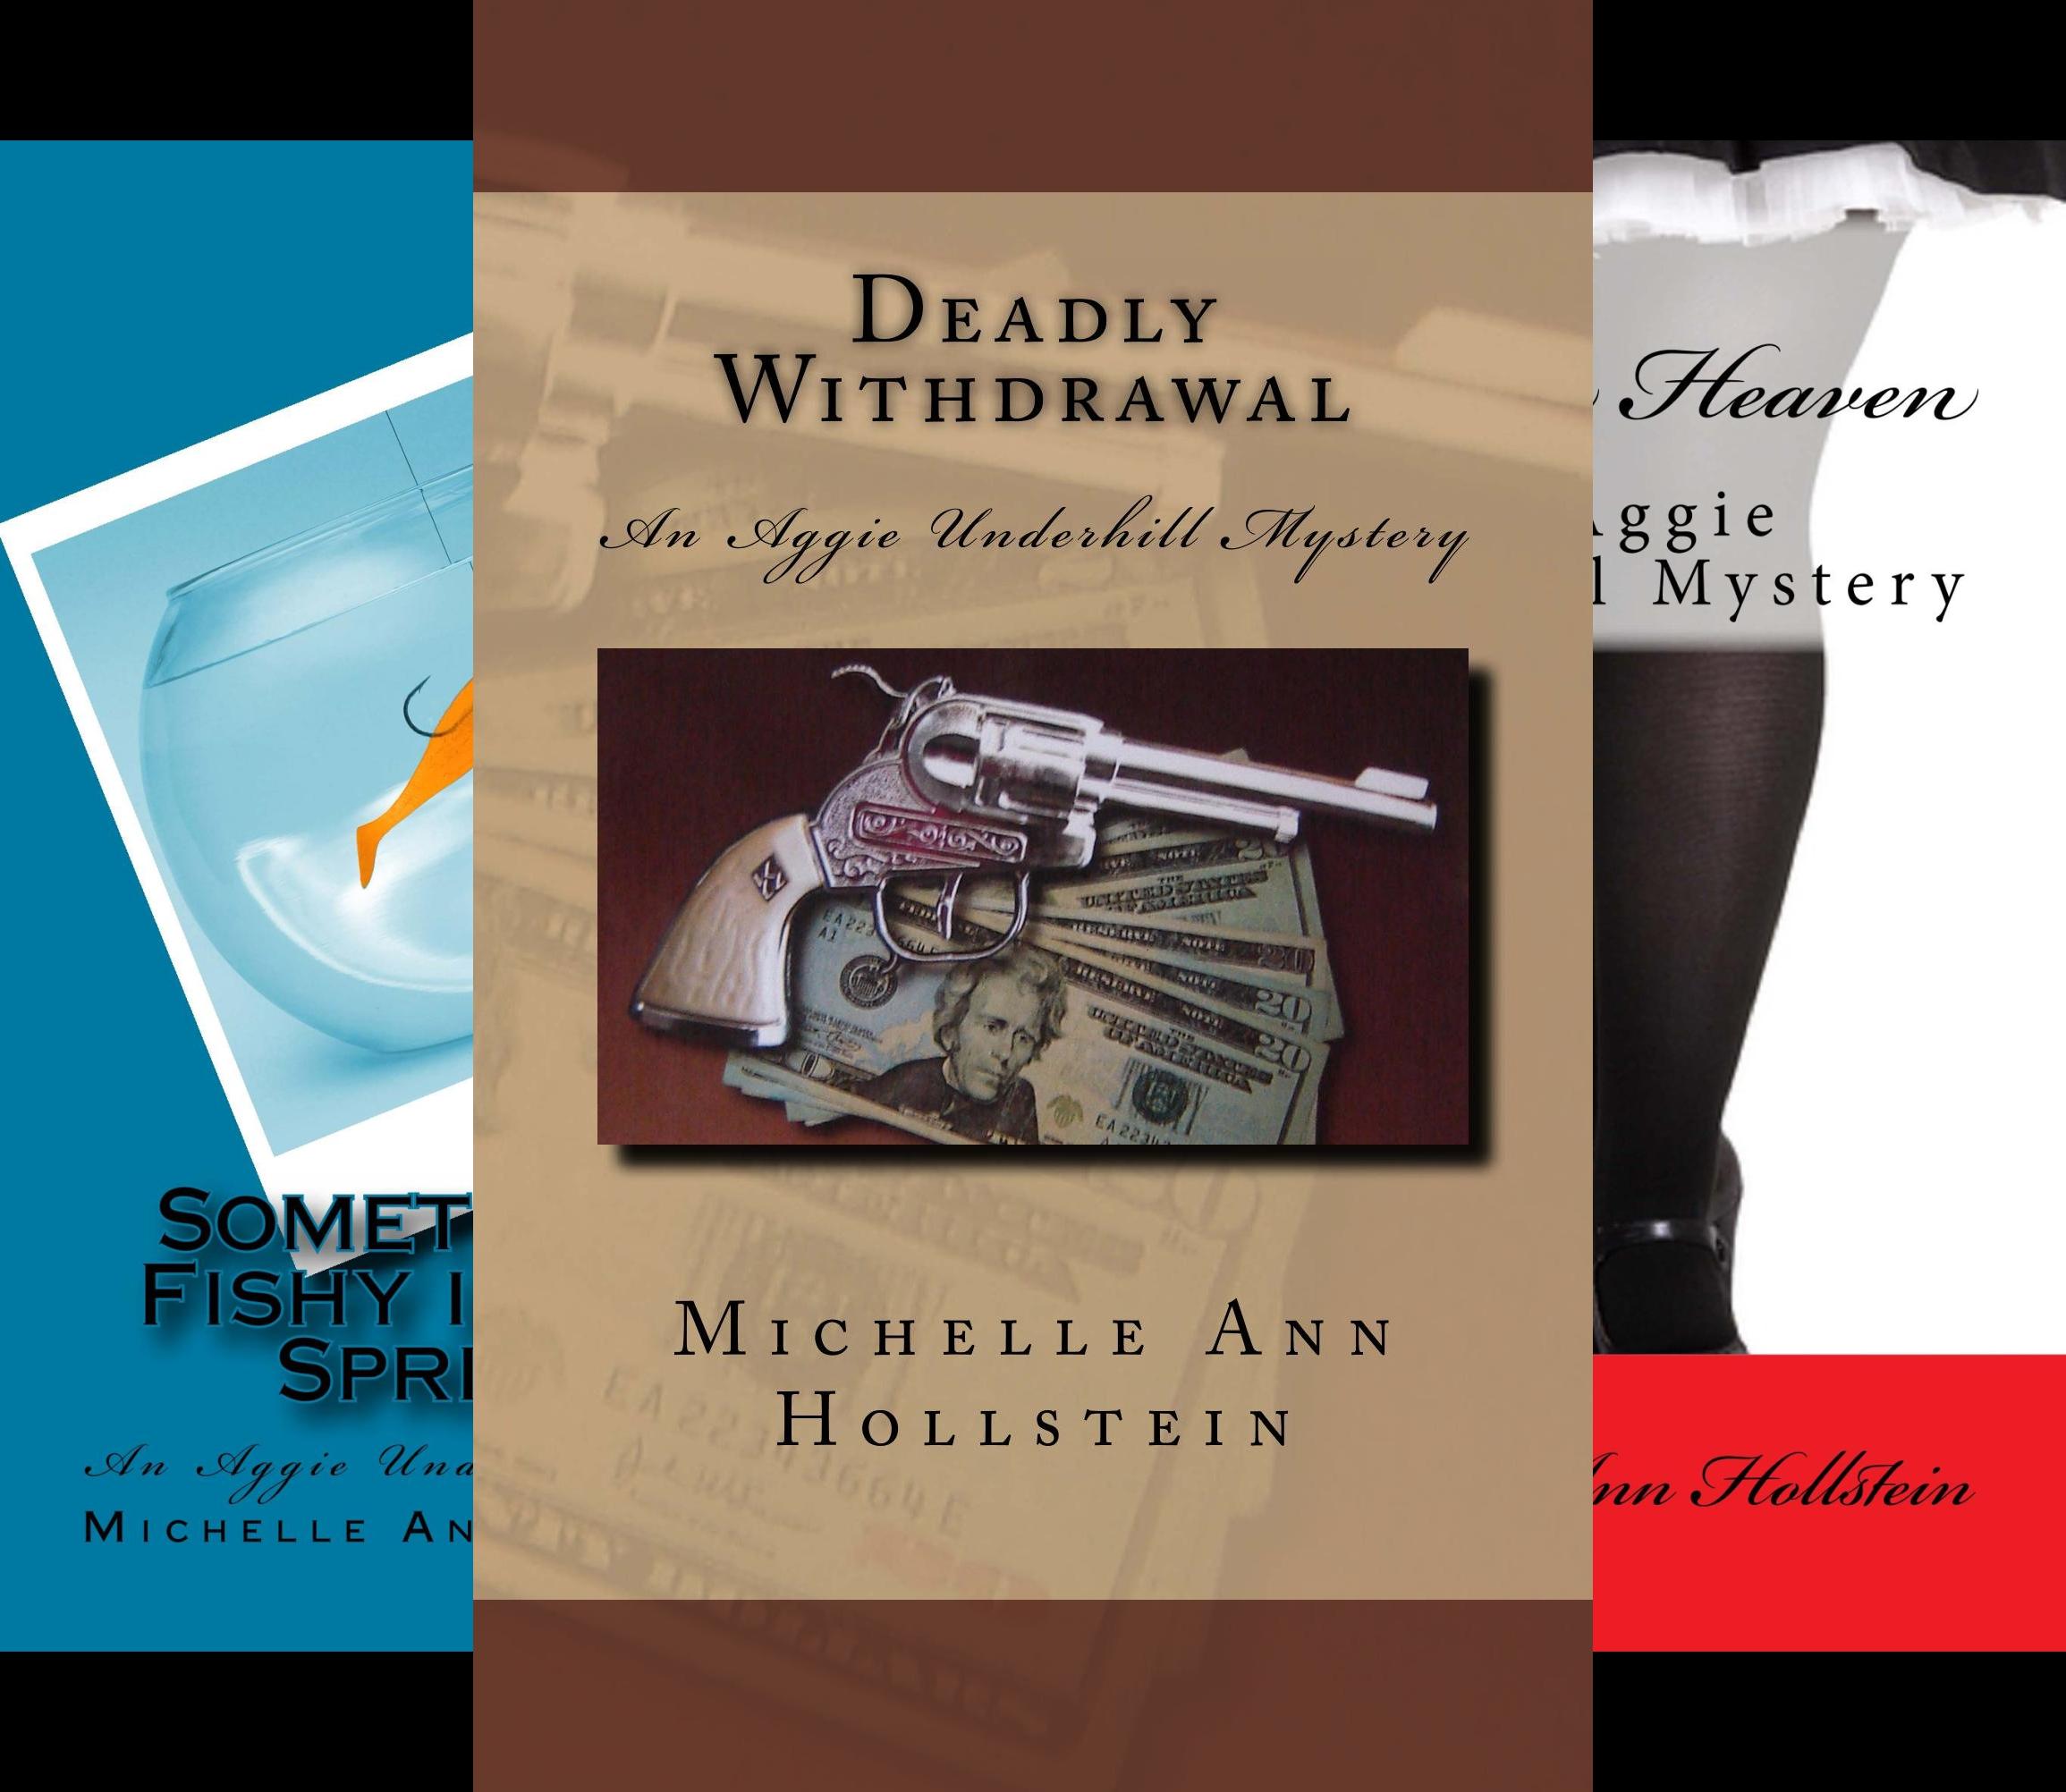 An Aggie Underhill Mystery (10 Book Series)